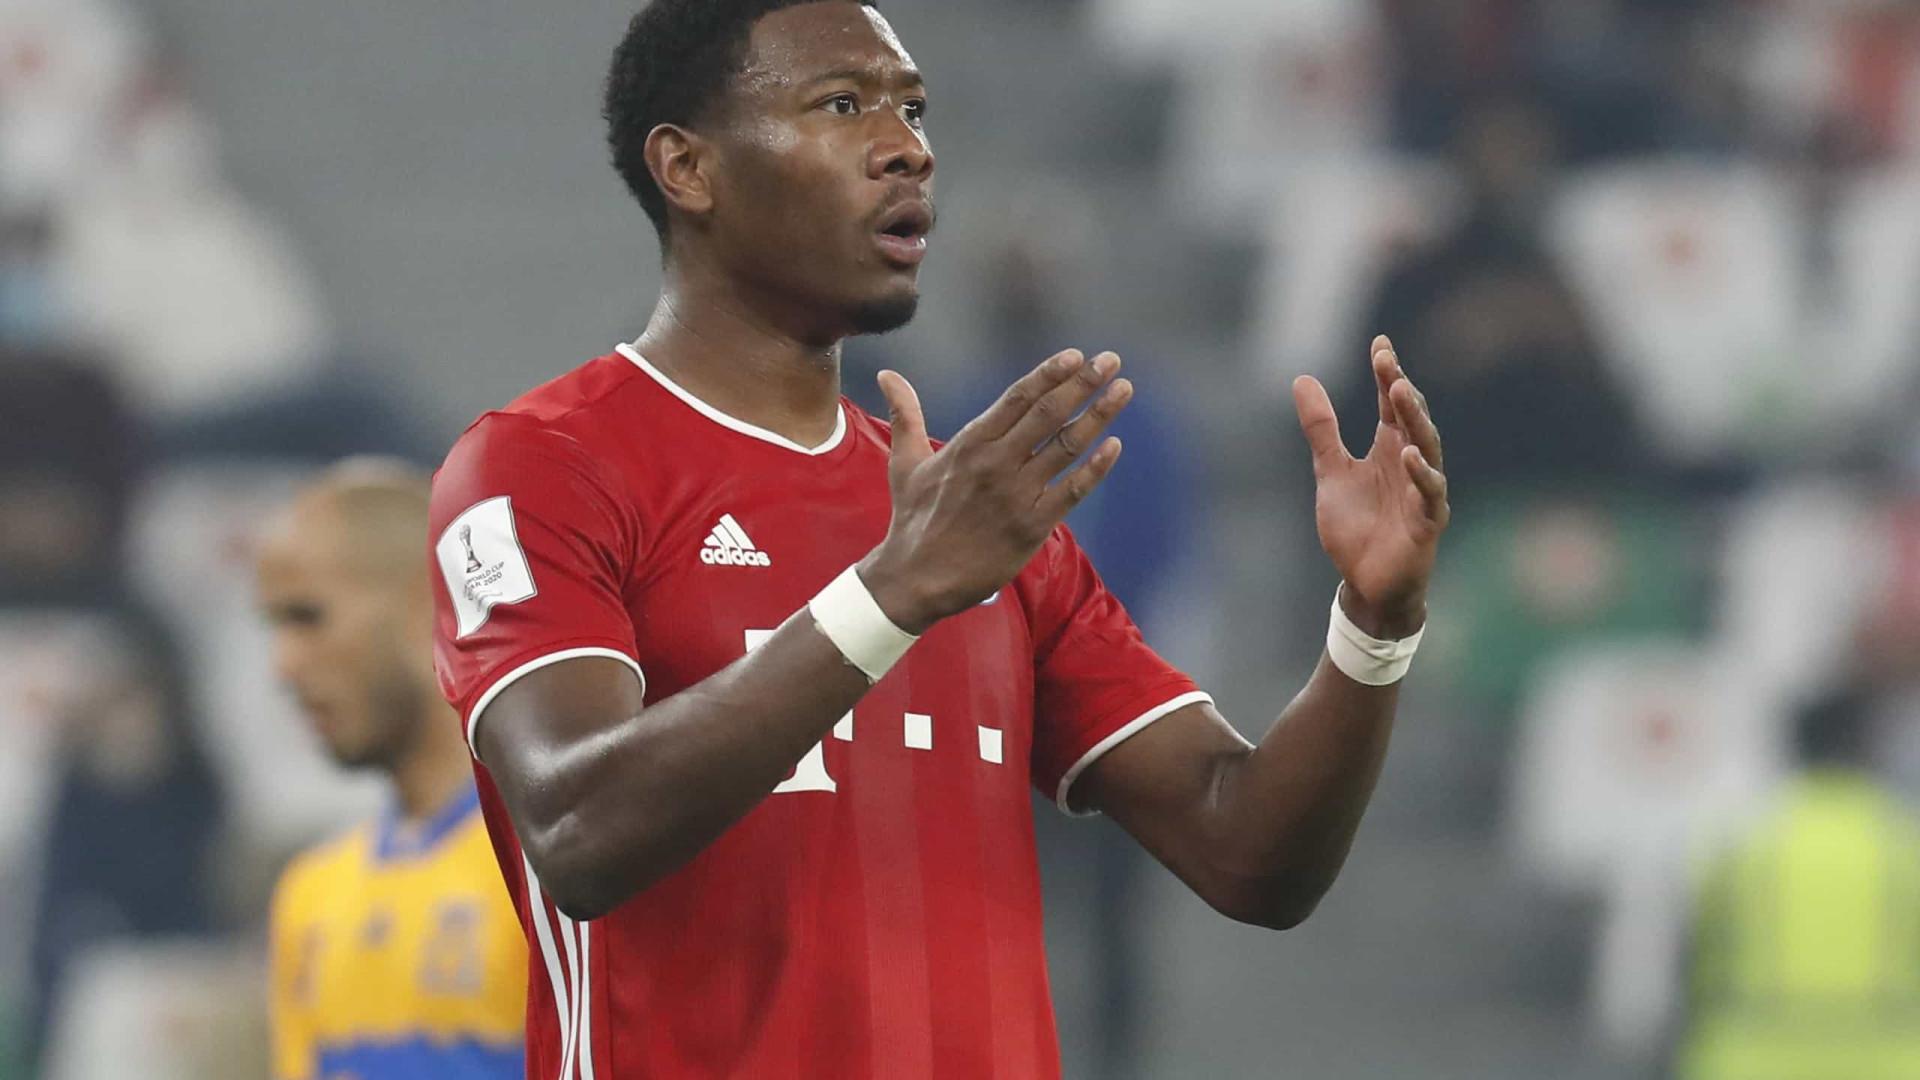 Alaba deixará Bayern de Munique após 13 anos e pode reforçar Real Madrid